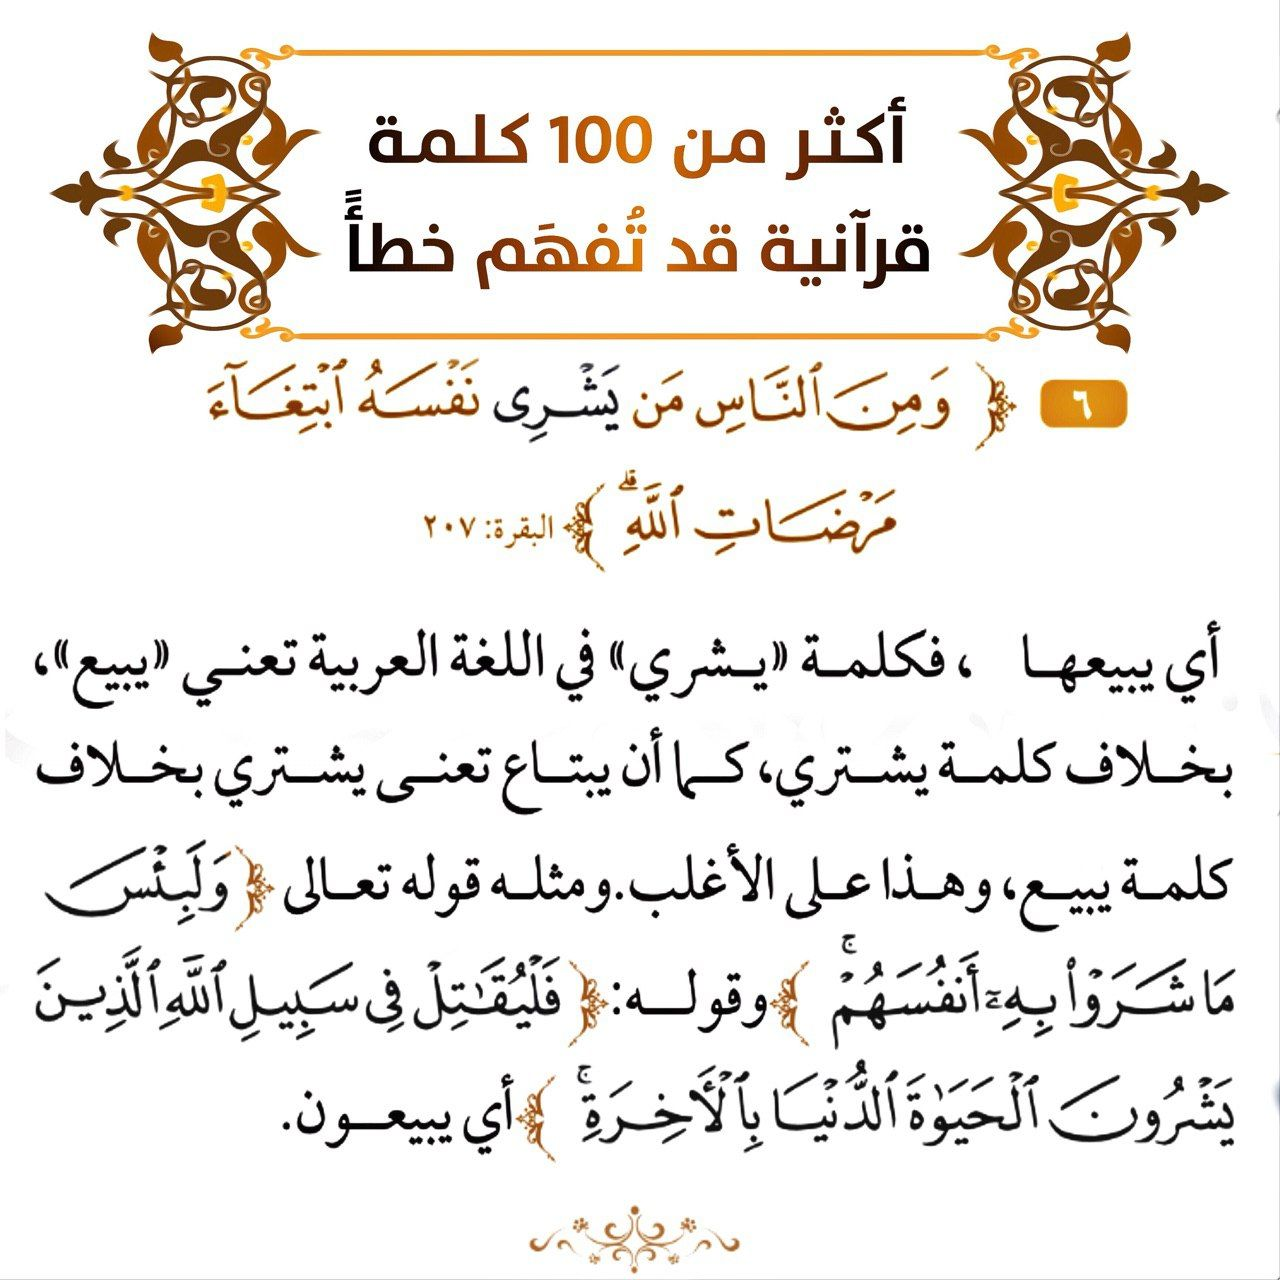 006 و م ن الن اس م ن ي شري ن فس ه ابت غاء م رضات الل ه And Of The People Is He Who Sells Himself Seeking Means To Intellegence Noble Quran Islam